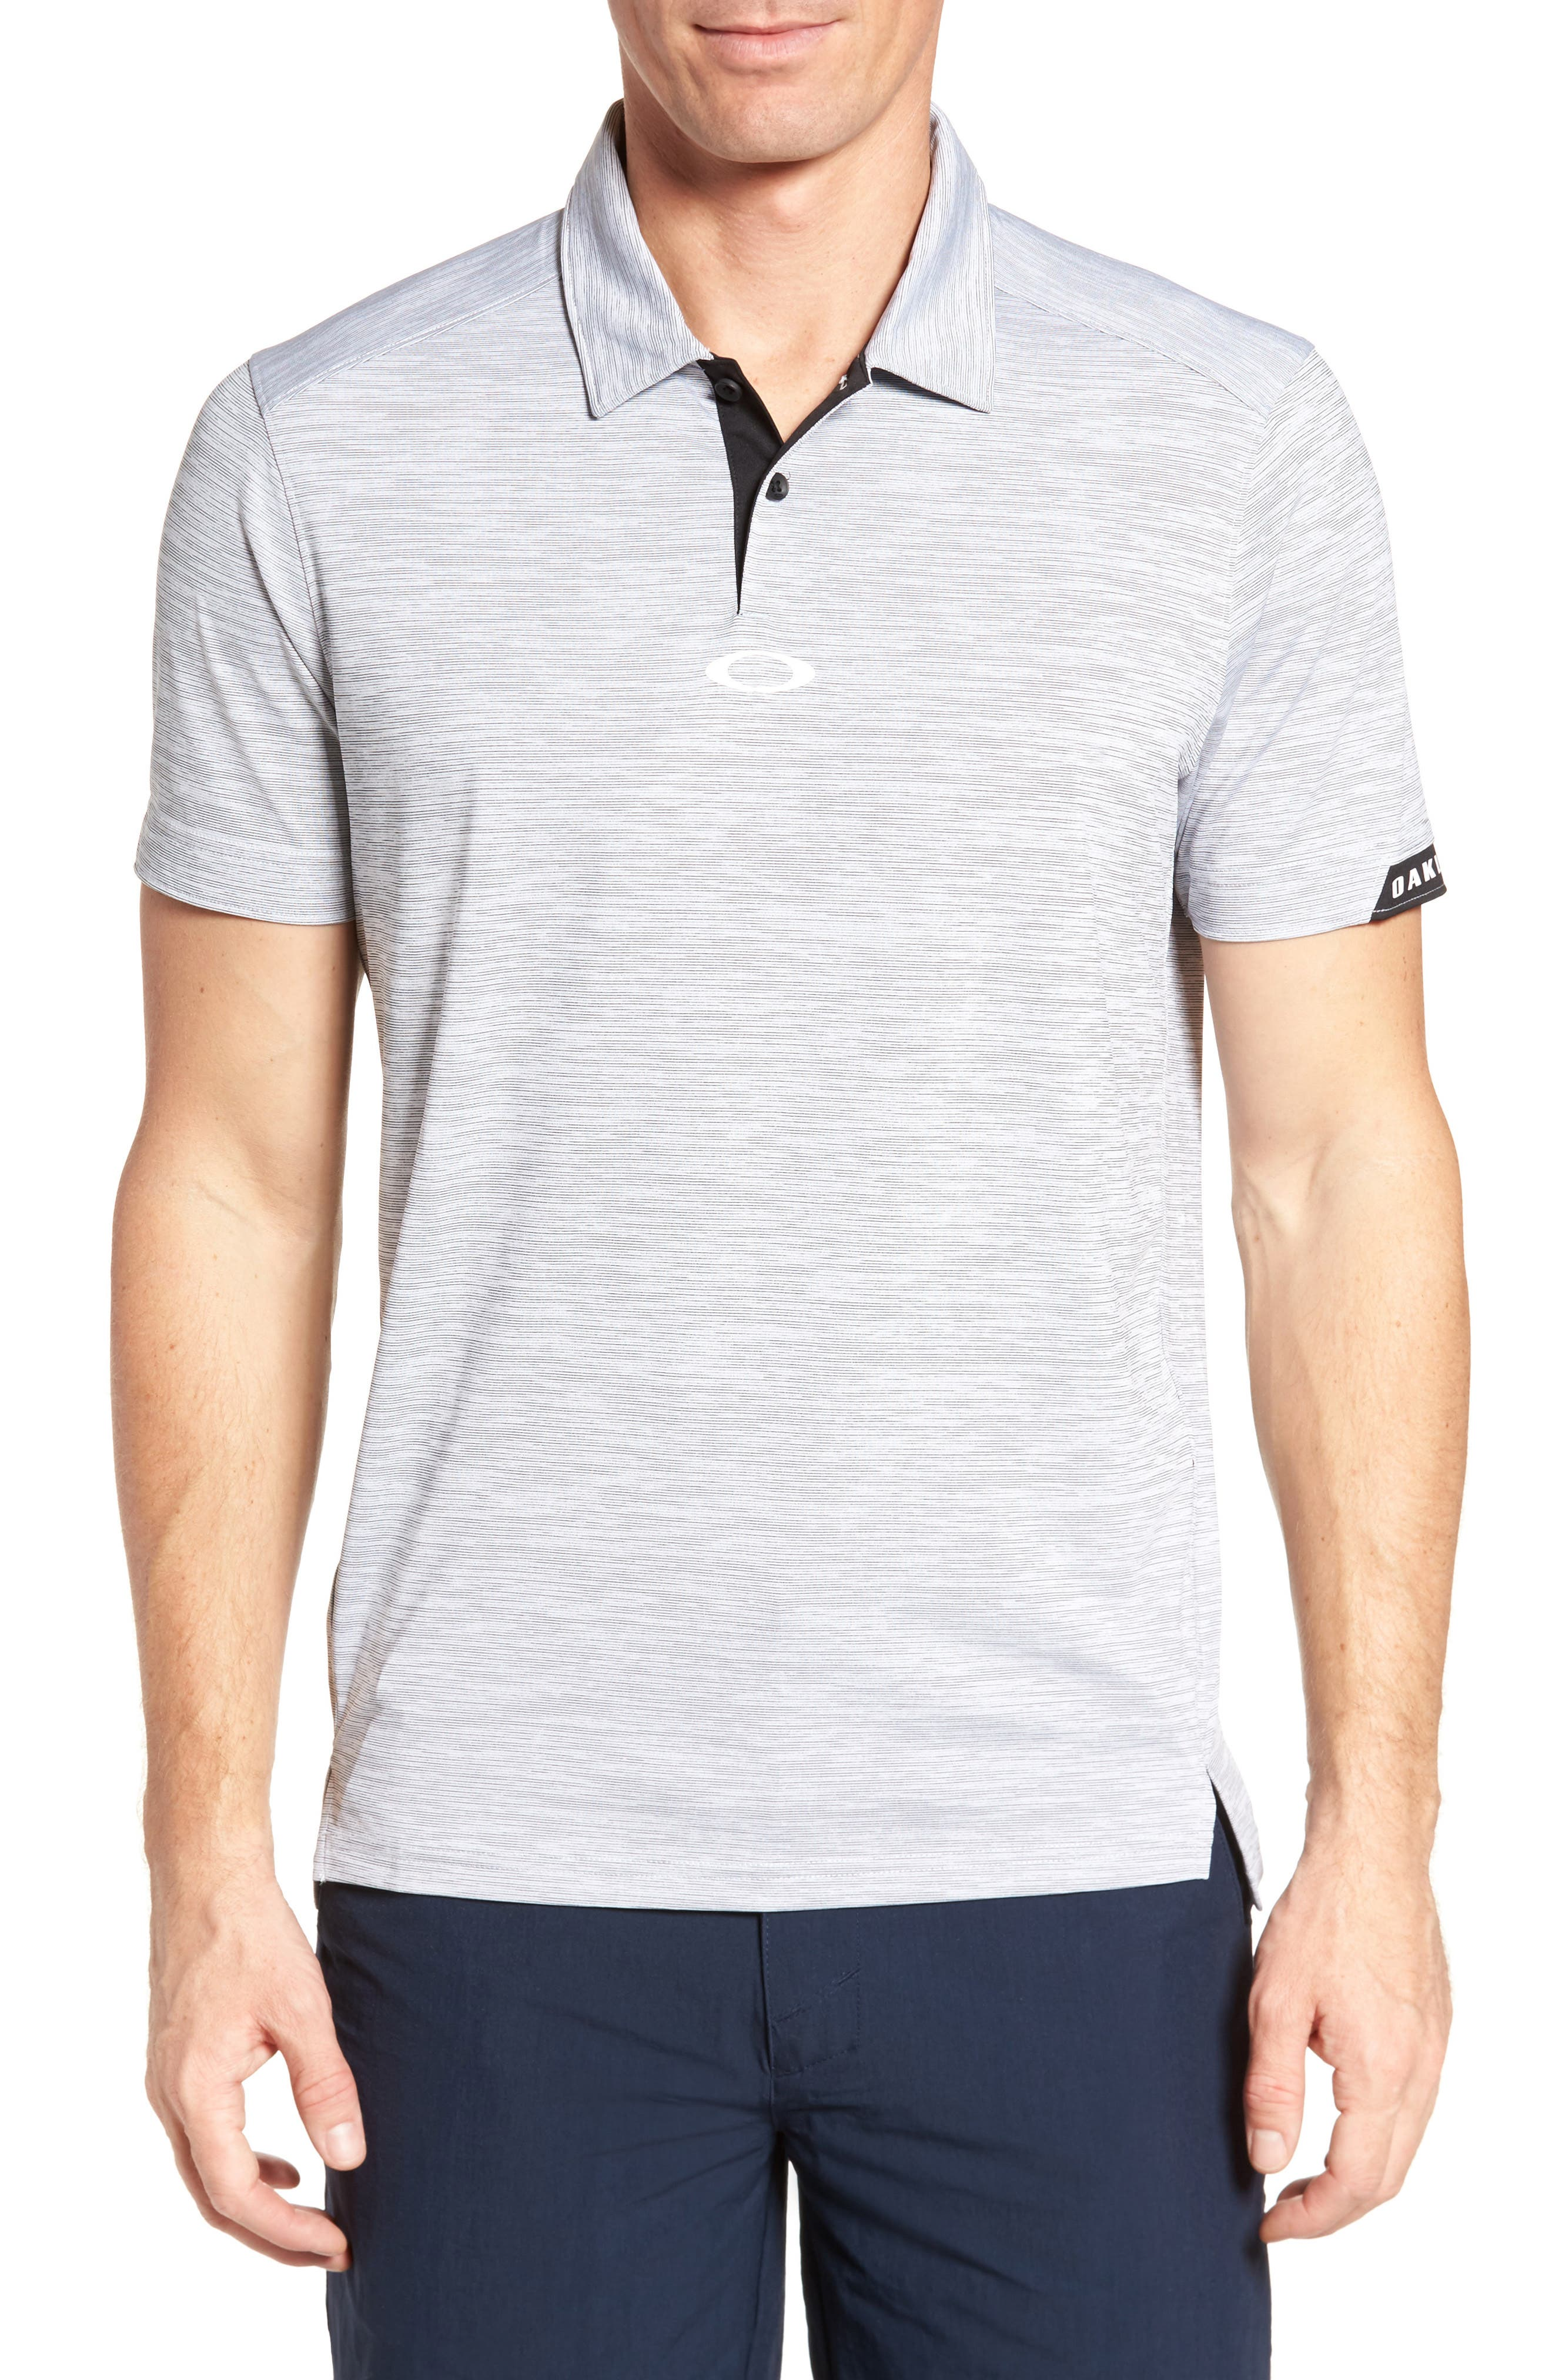 Gravity Polo Shirt,                             Main thumbnail 1, color,                             BLACKOUT